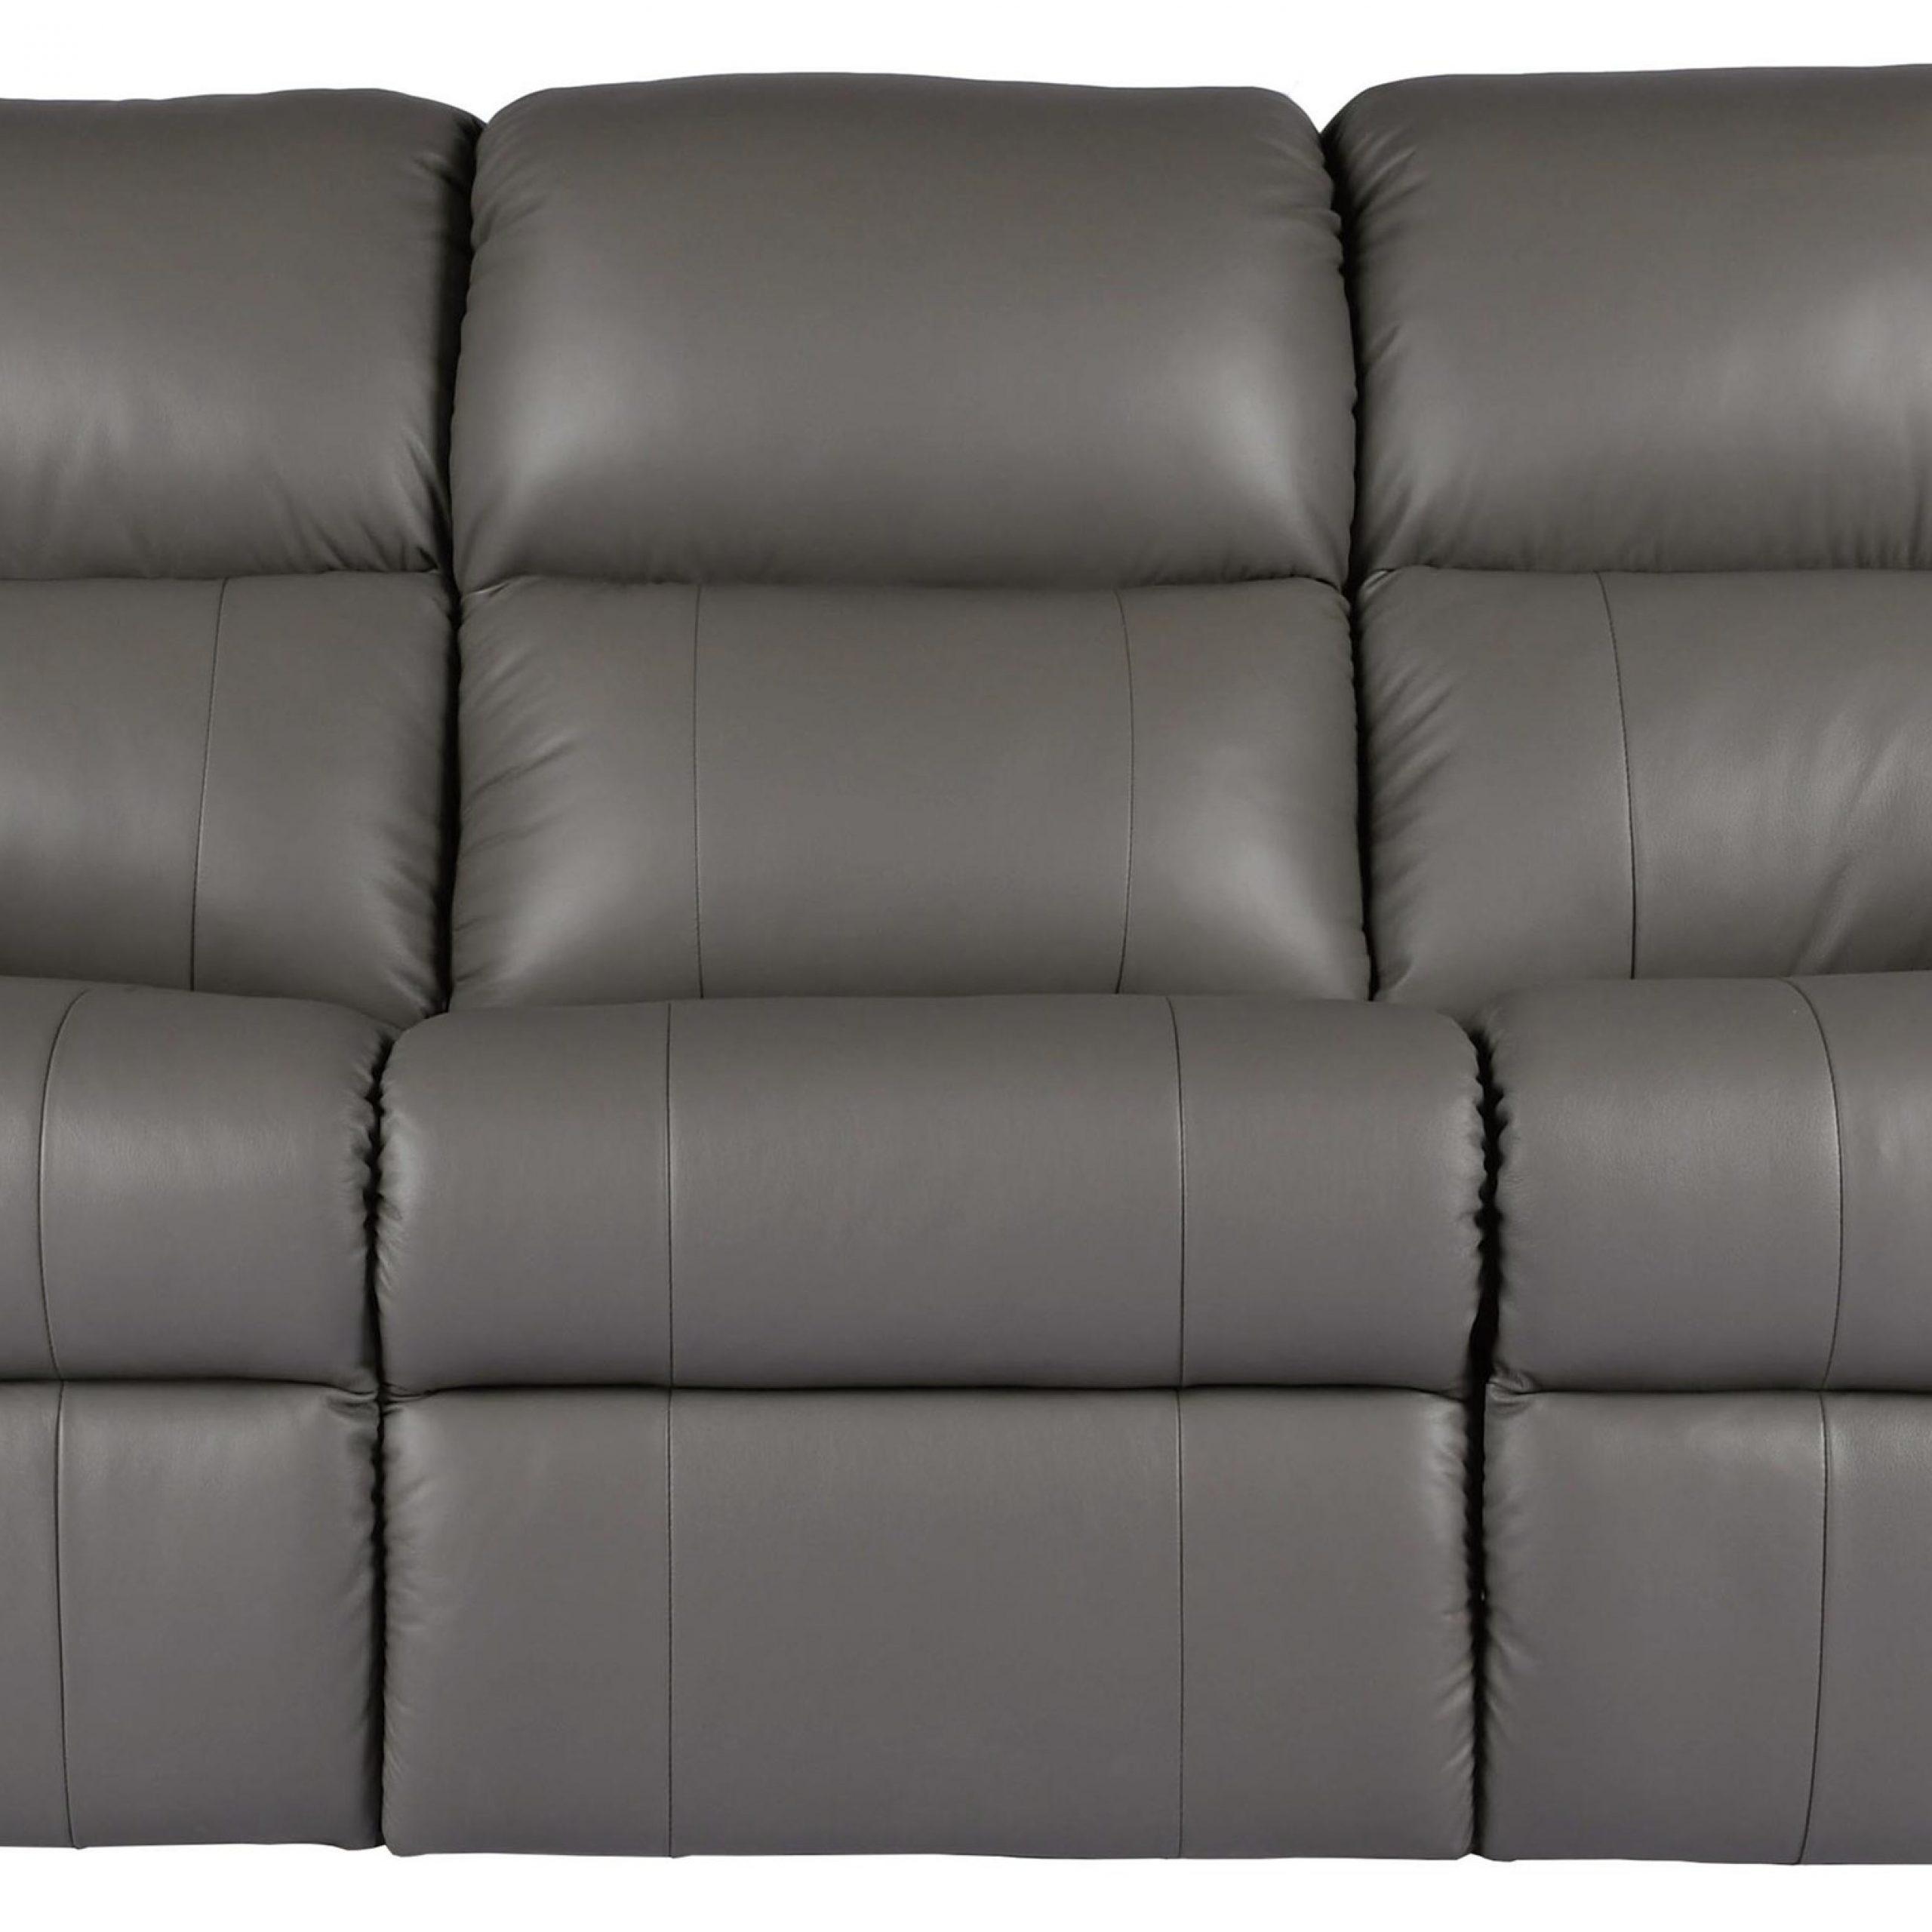 Recent Bennett Power Reclining Sofas In Rockwood Burleigh Power Reclining Sofa With Pillow Arms (View 15 of 20)